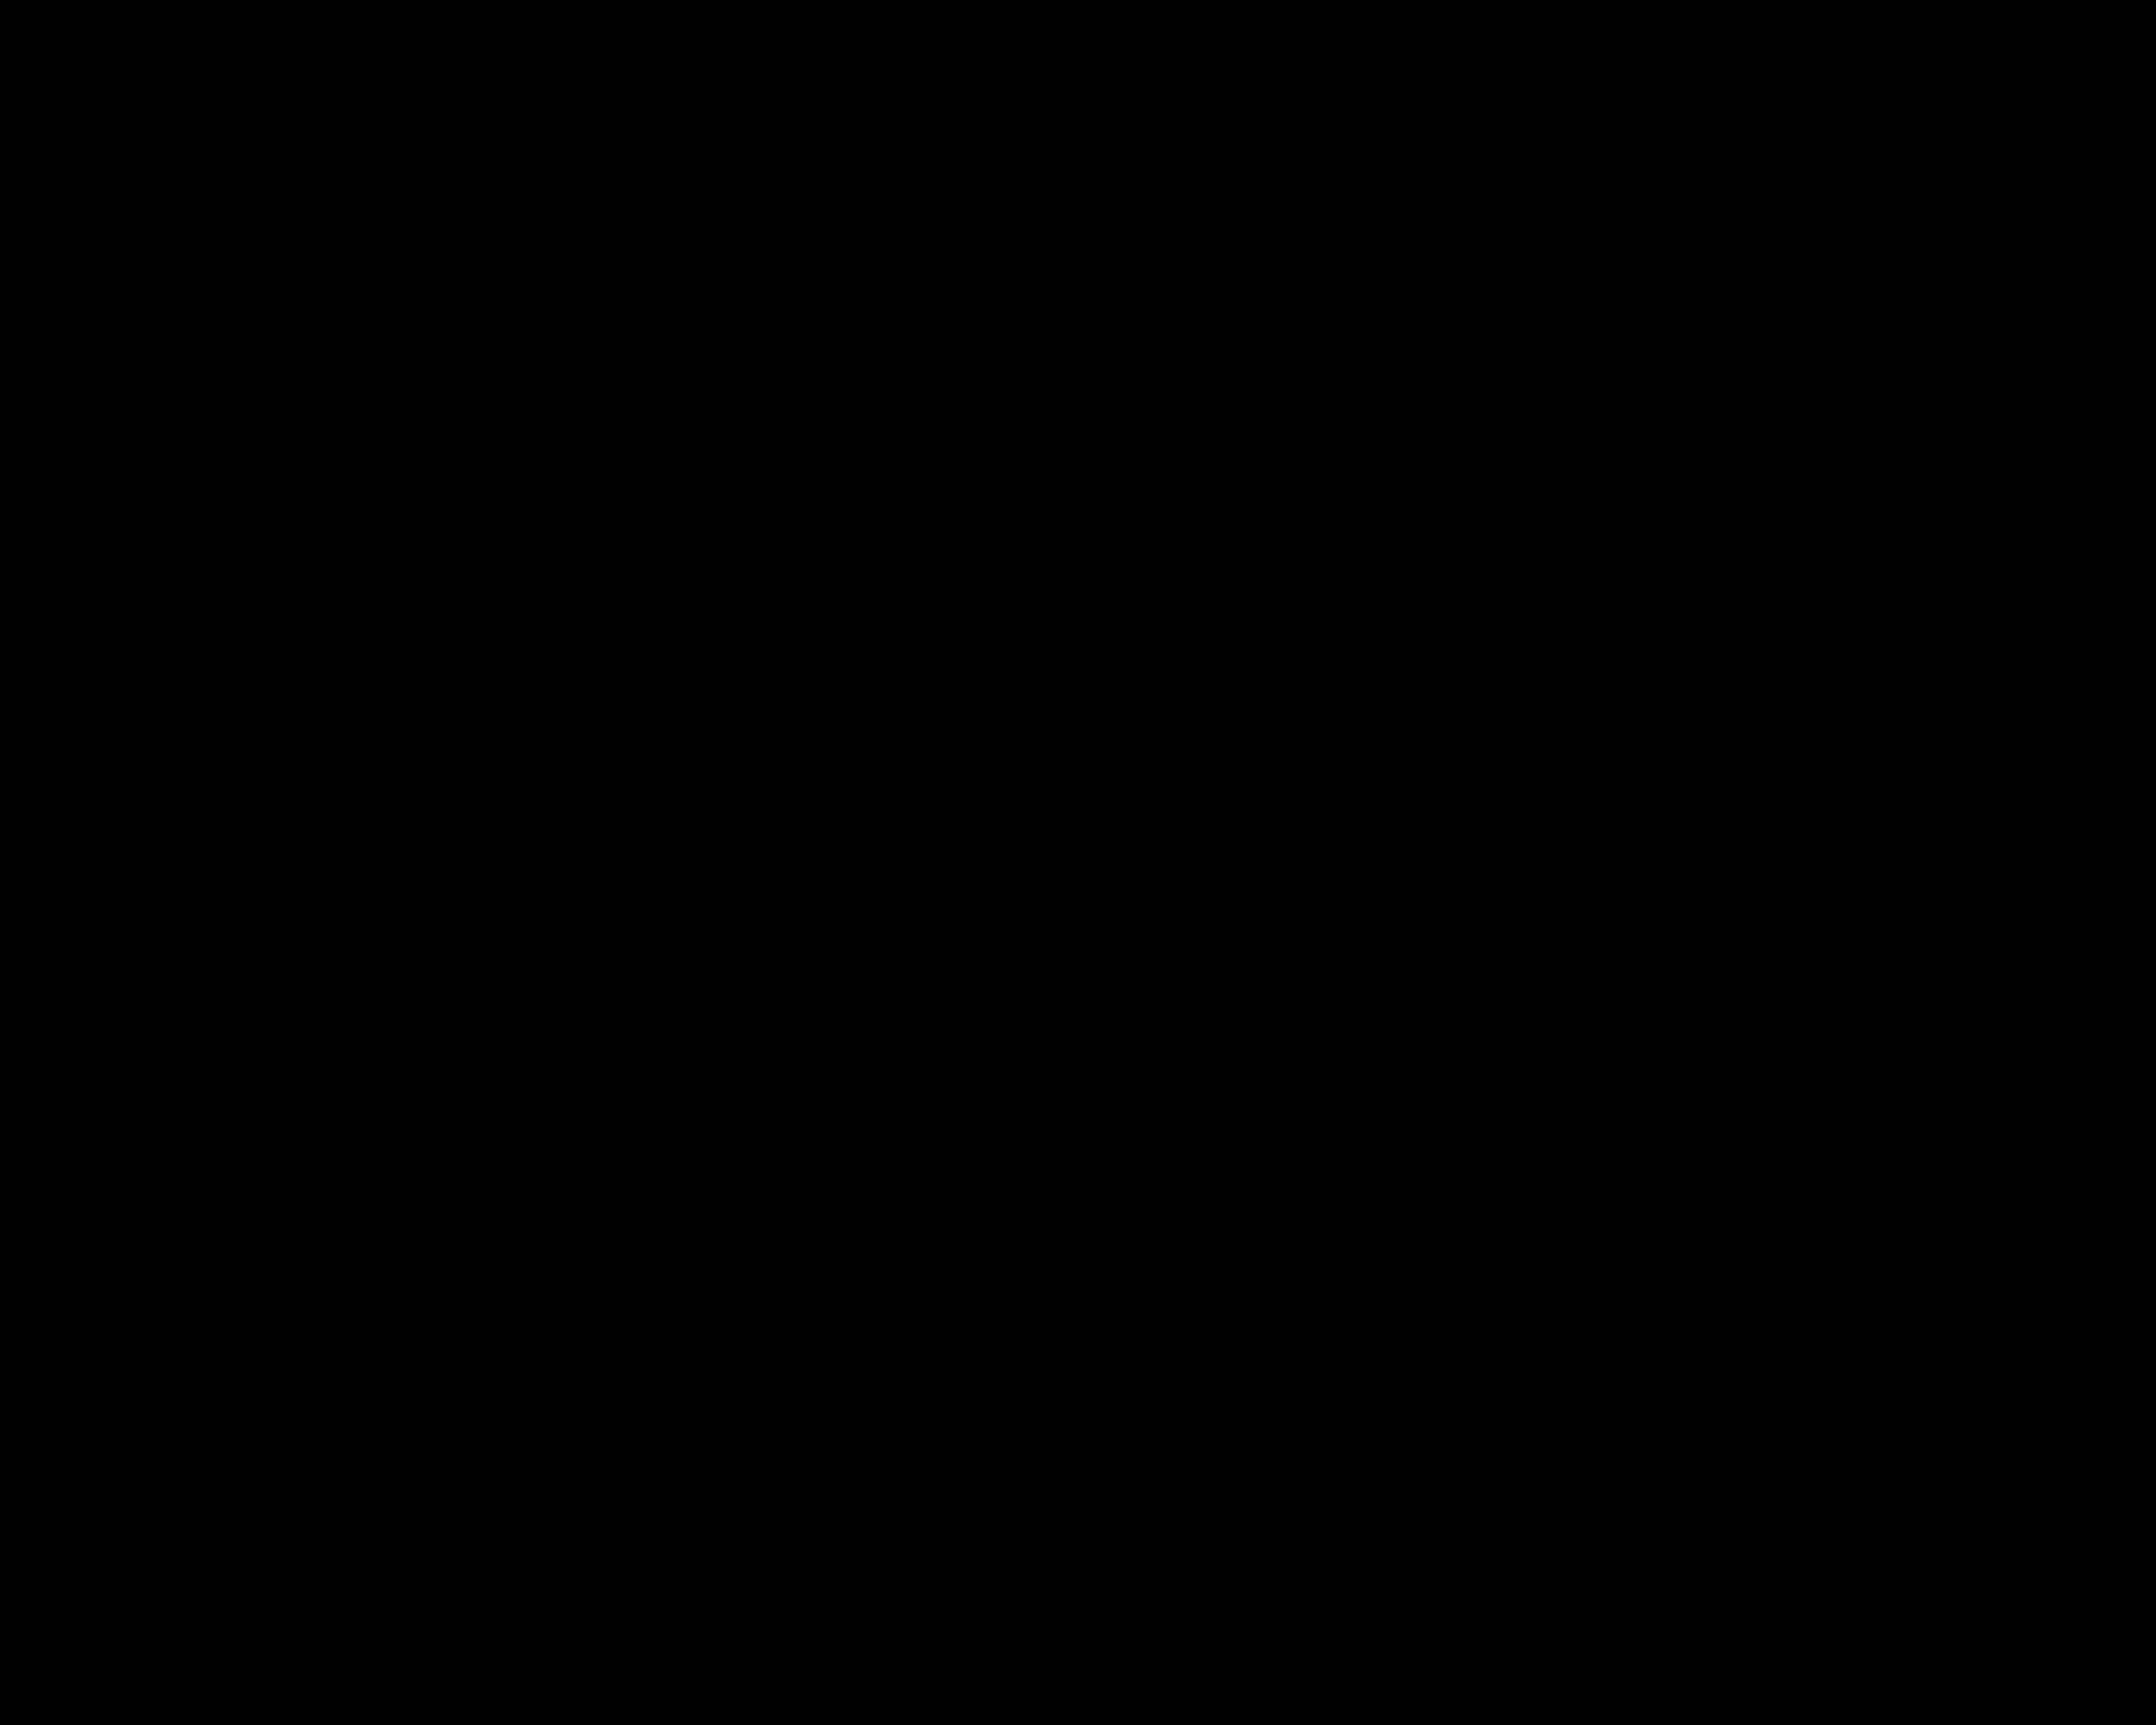 MainBannerBakeryArtboard 8-200.png